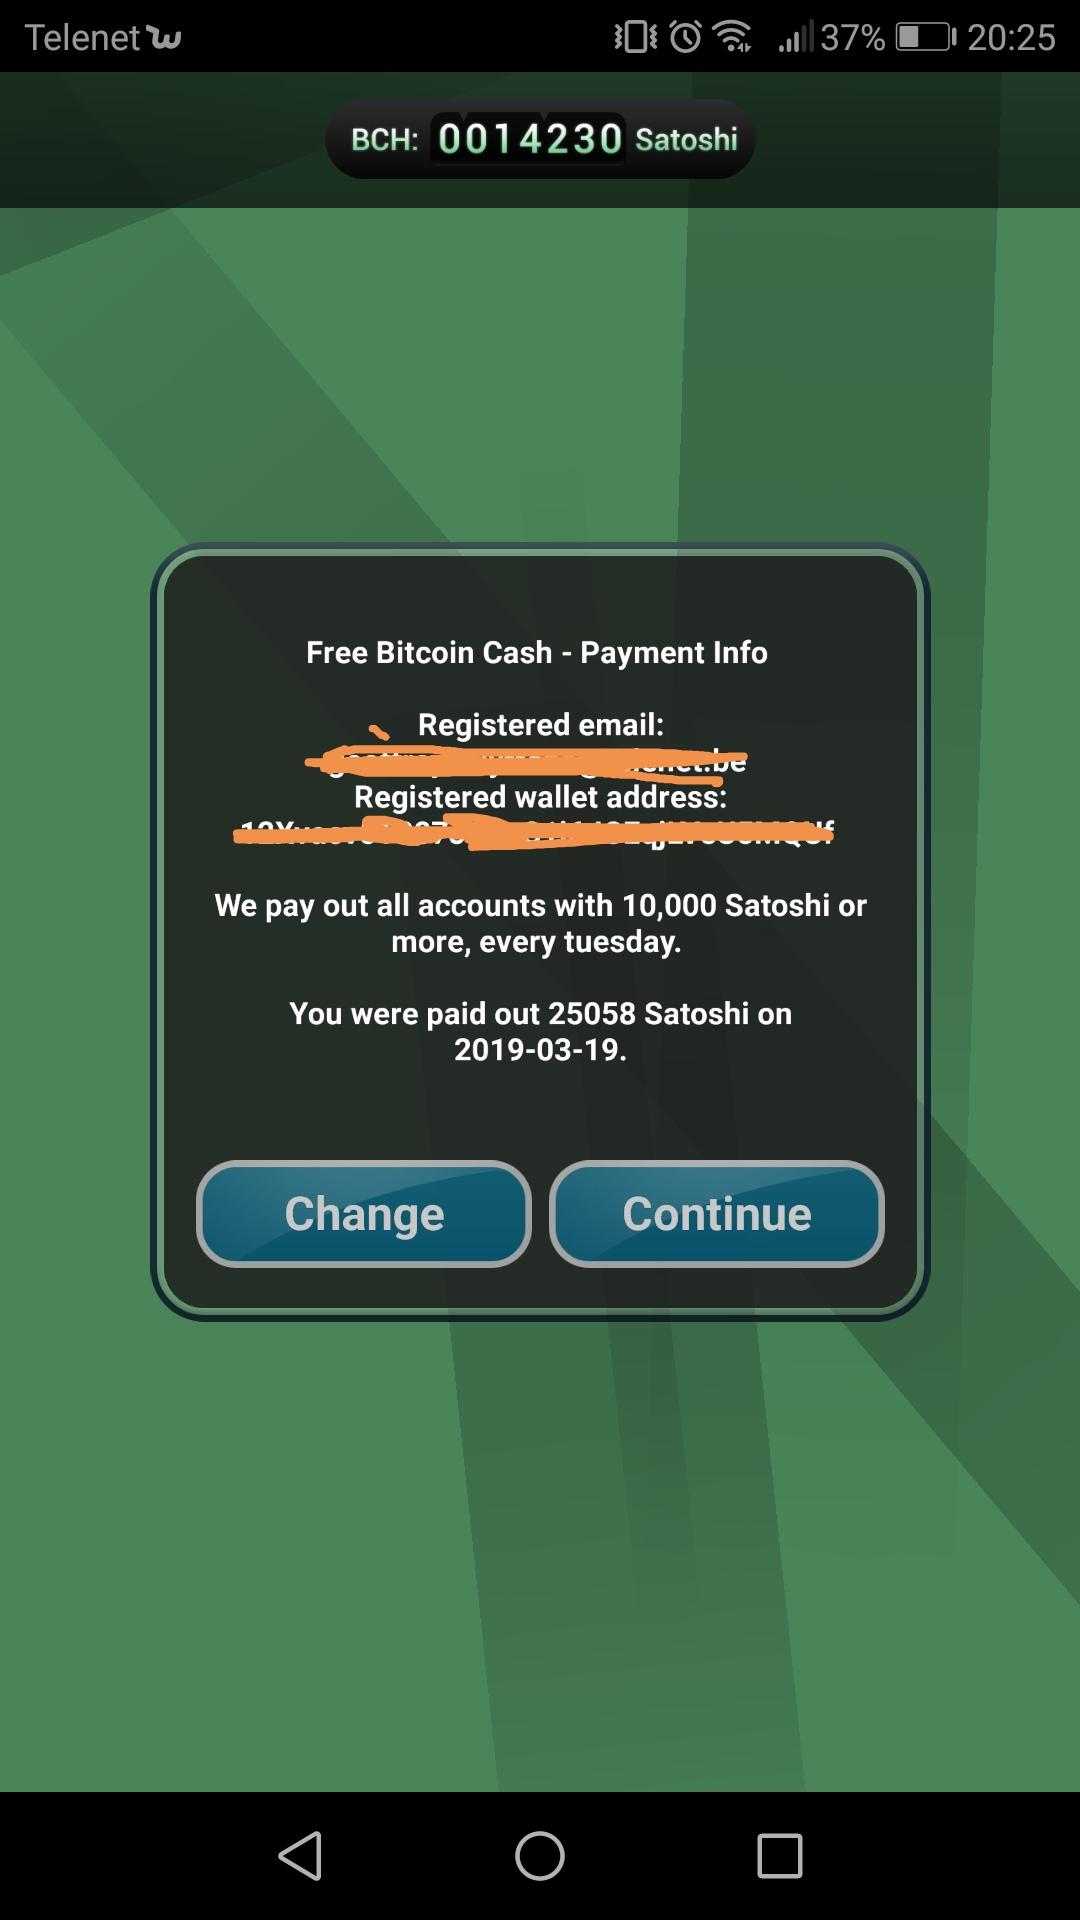 LEGIT - Free Bitcoin Cash App Reviews:SCAM or LEGIT